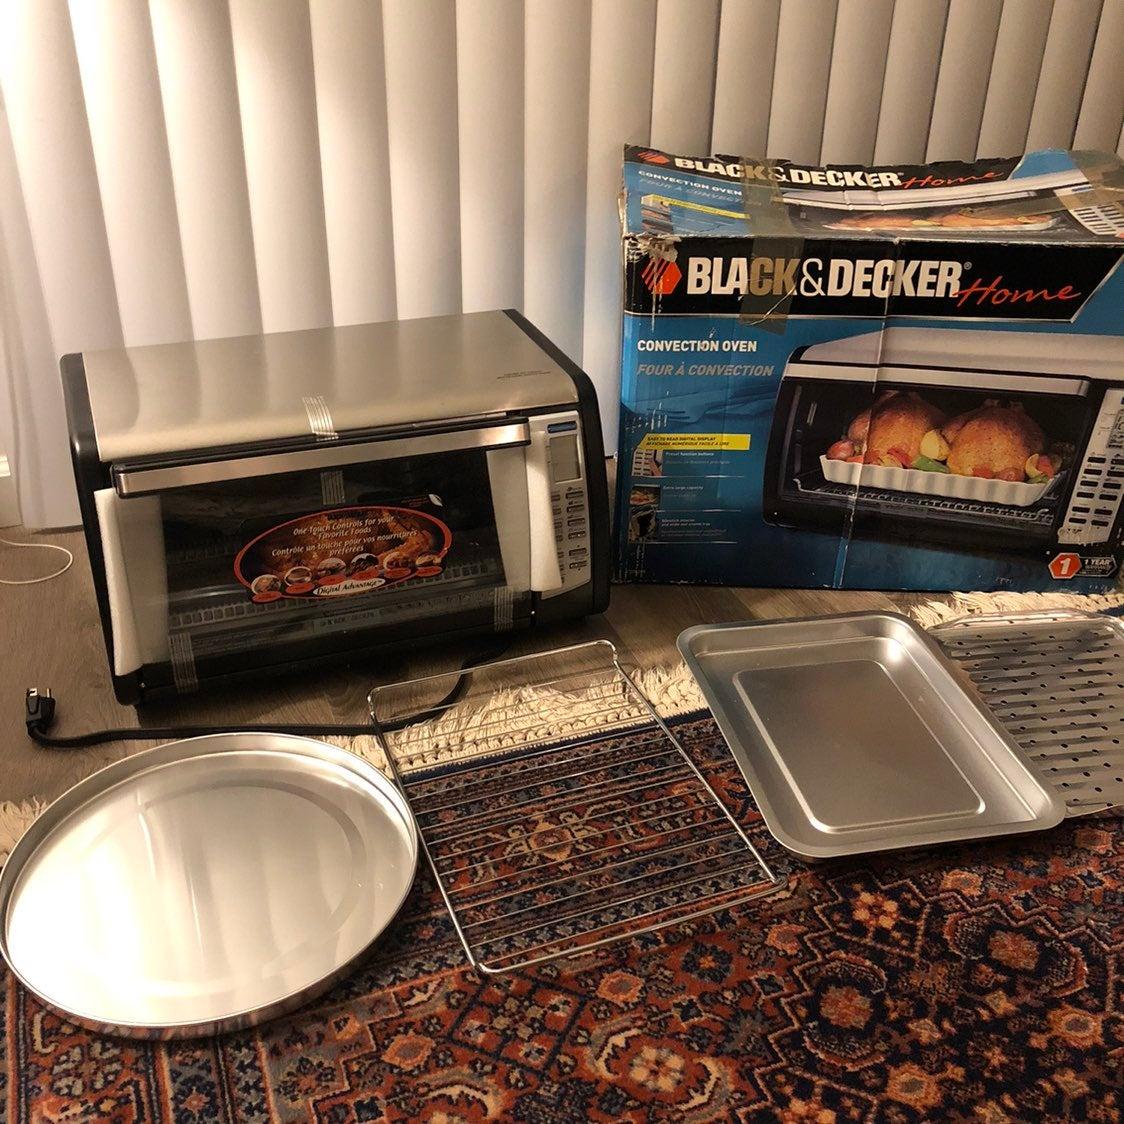 NEW! Black & Decker Convection Oven!